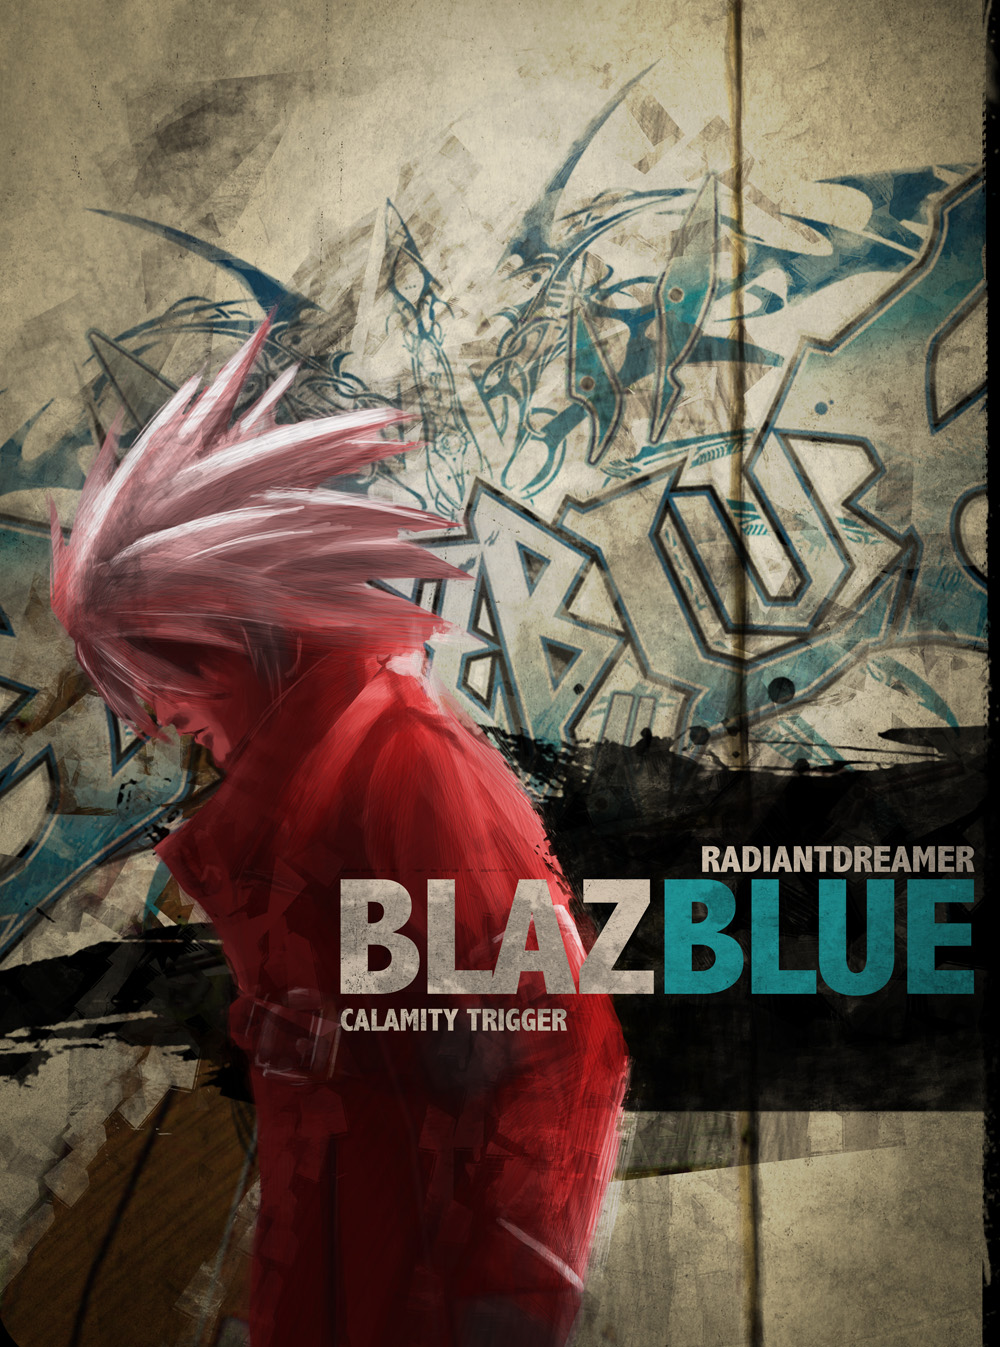 Blazblue Official EU poster by vihena